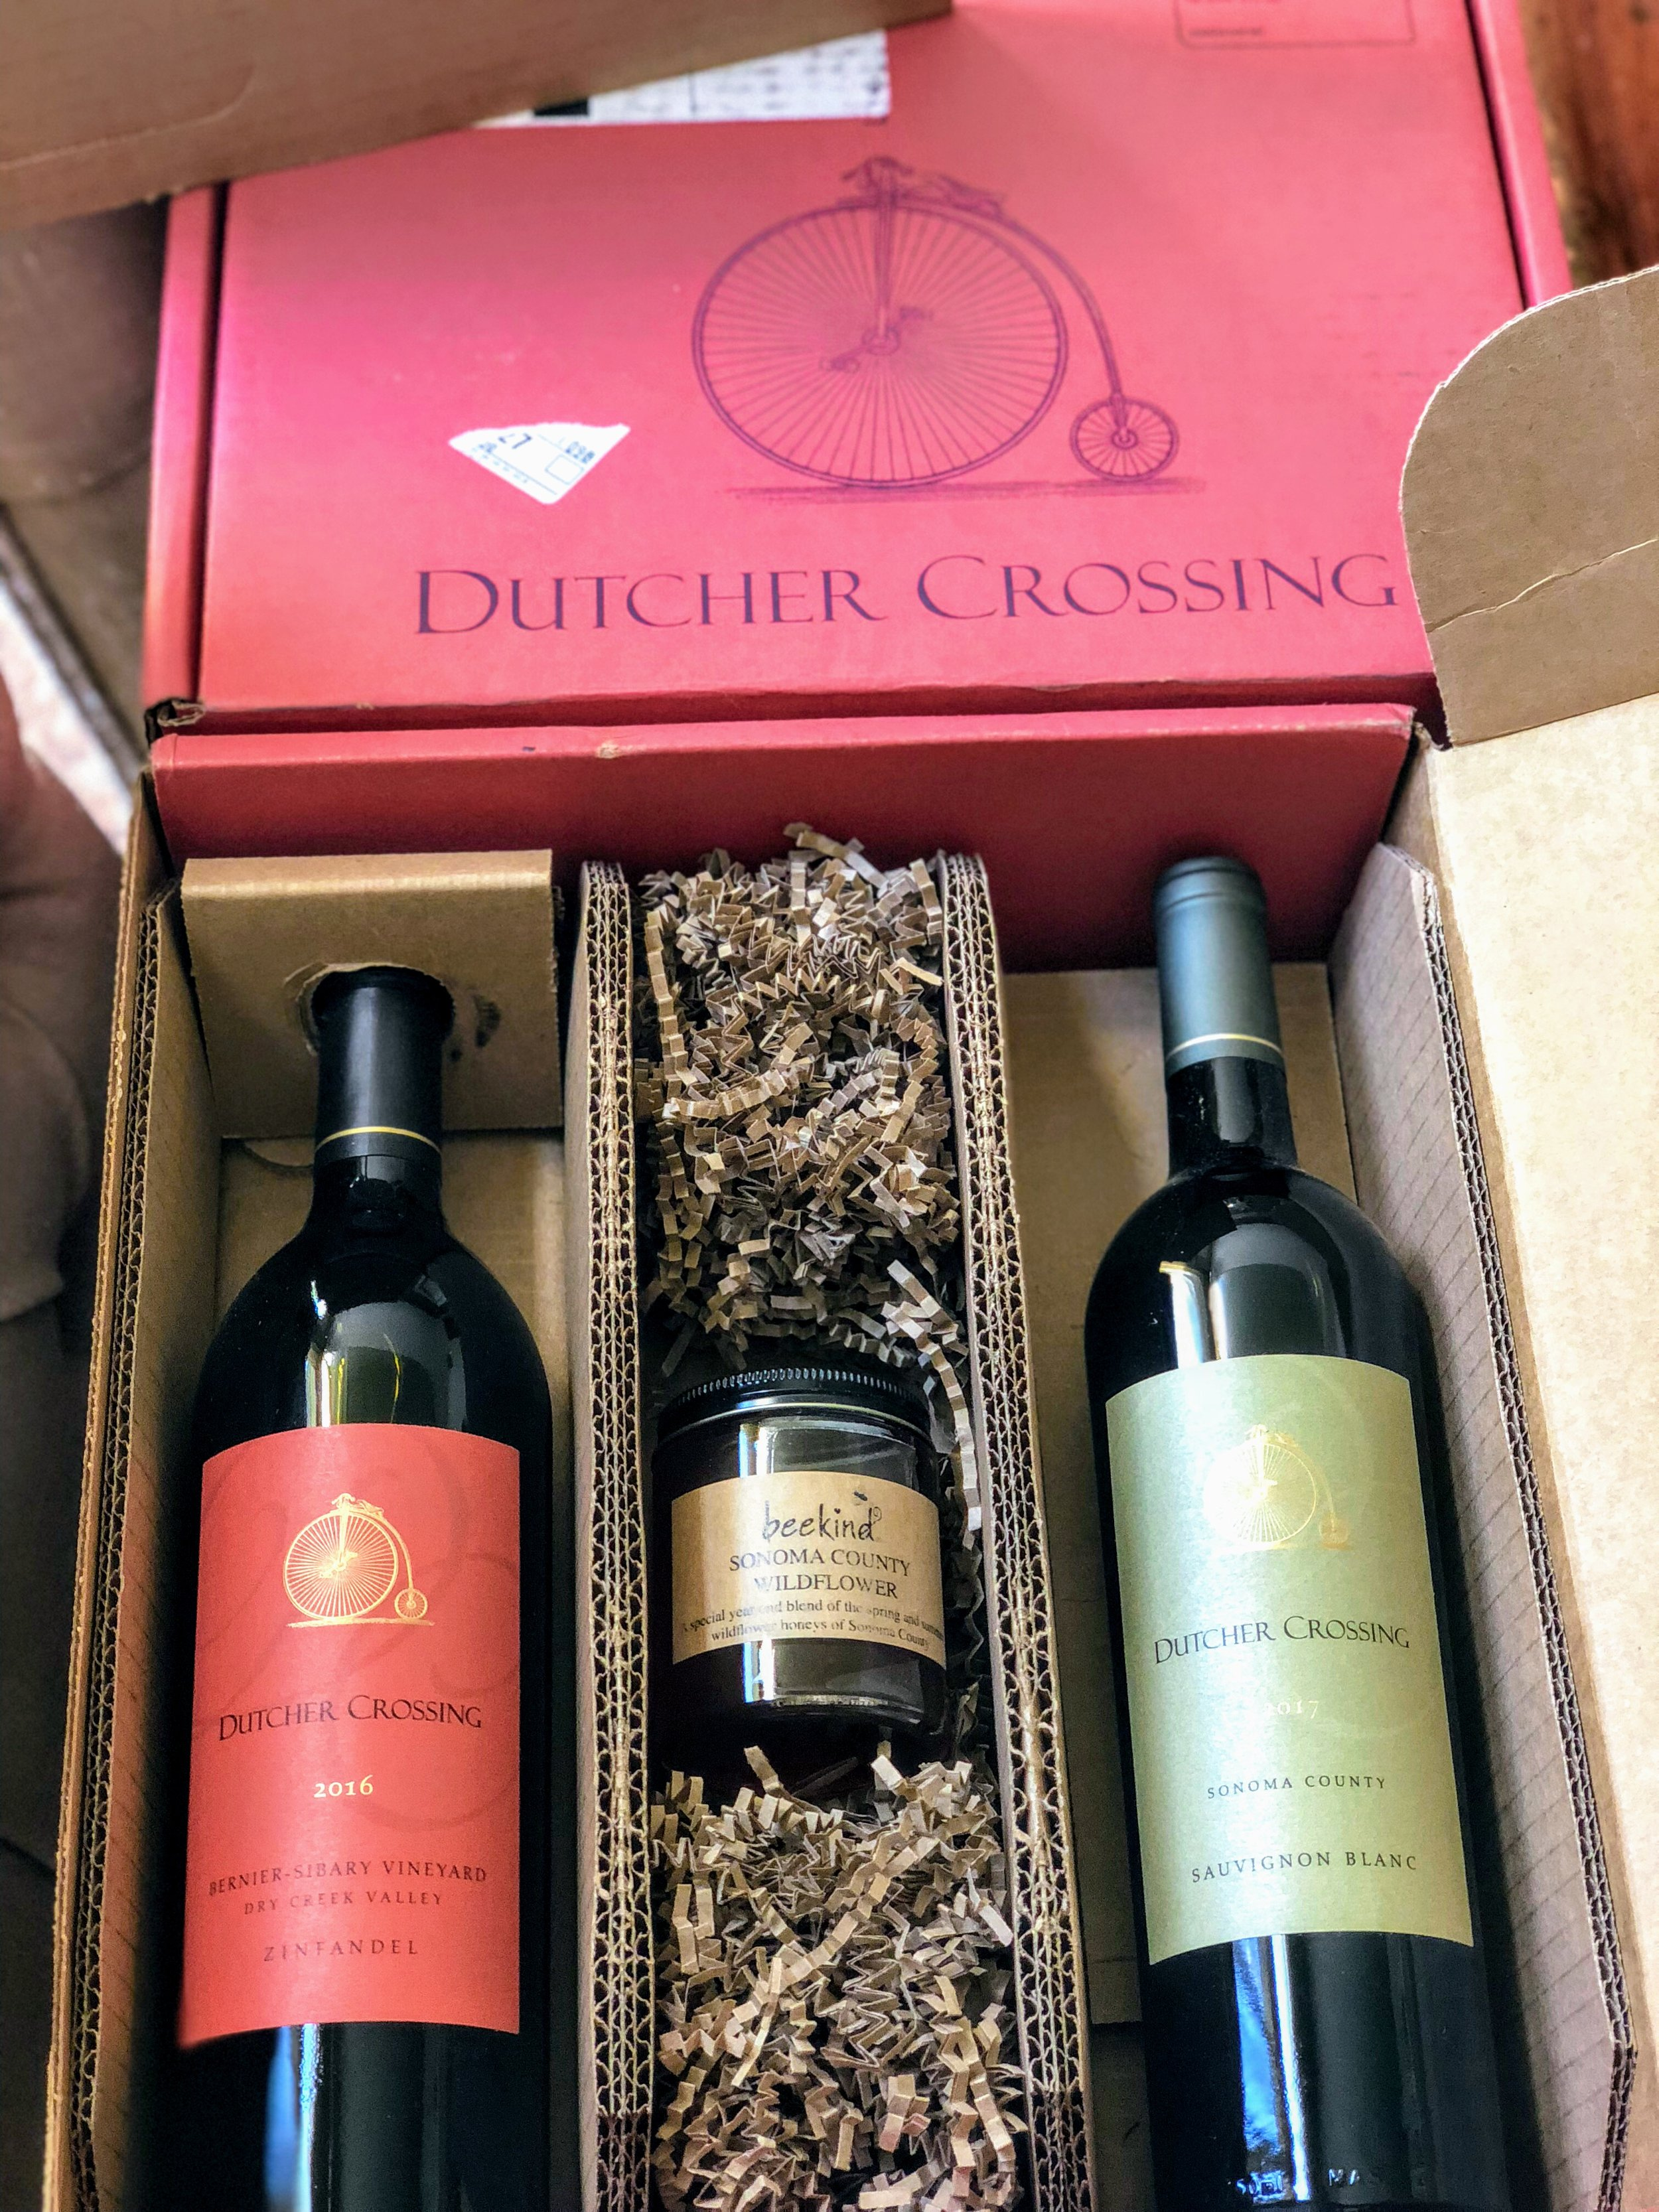 Dutcher Crossing Wine Club Shipment